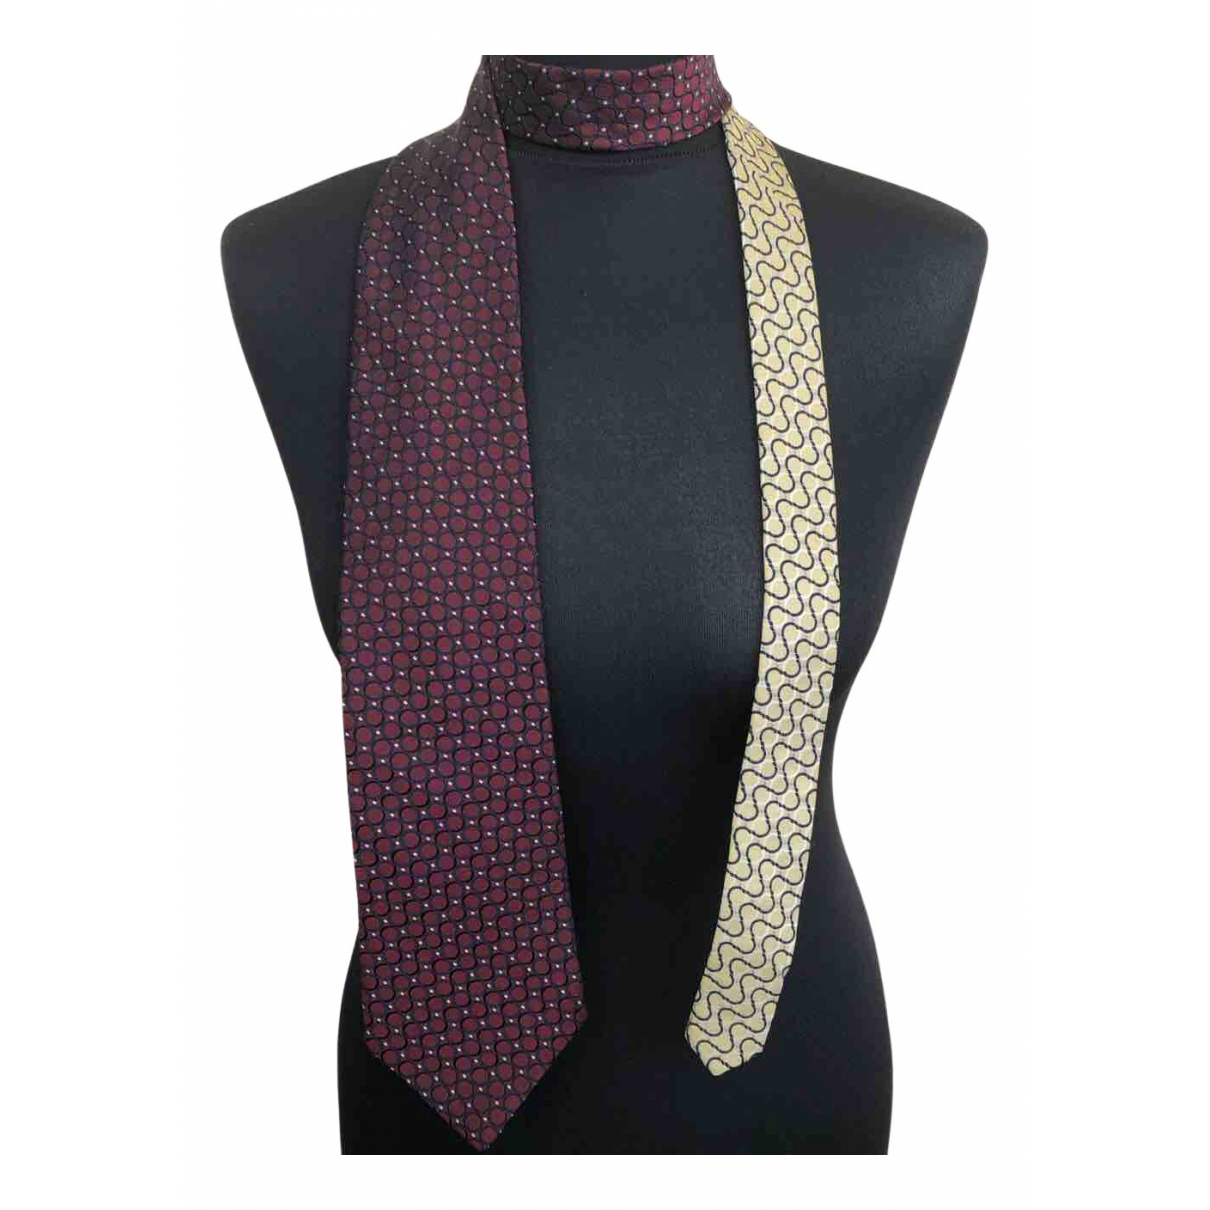 Corbata de Seda Tommy Hilfiger